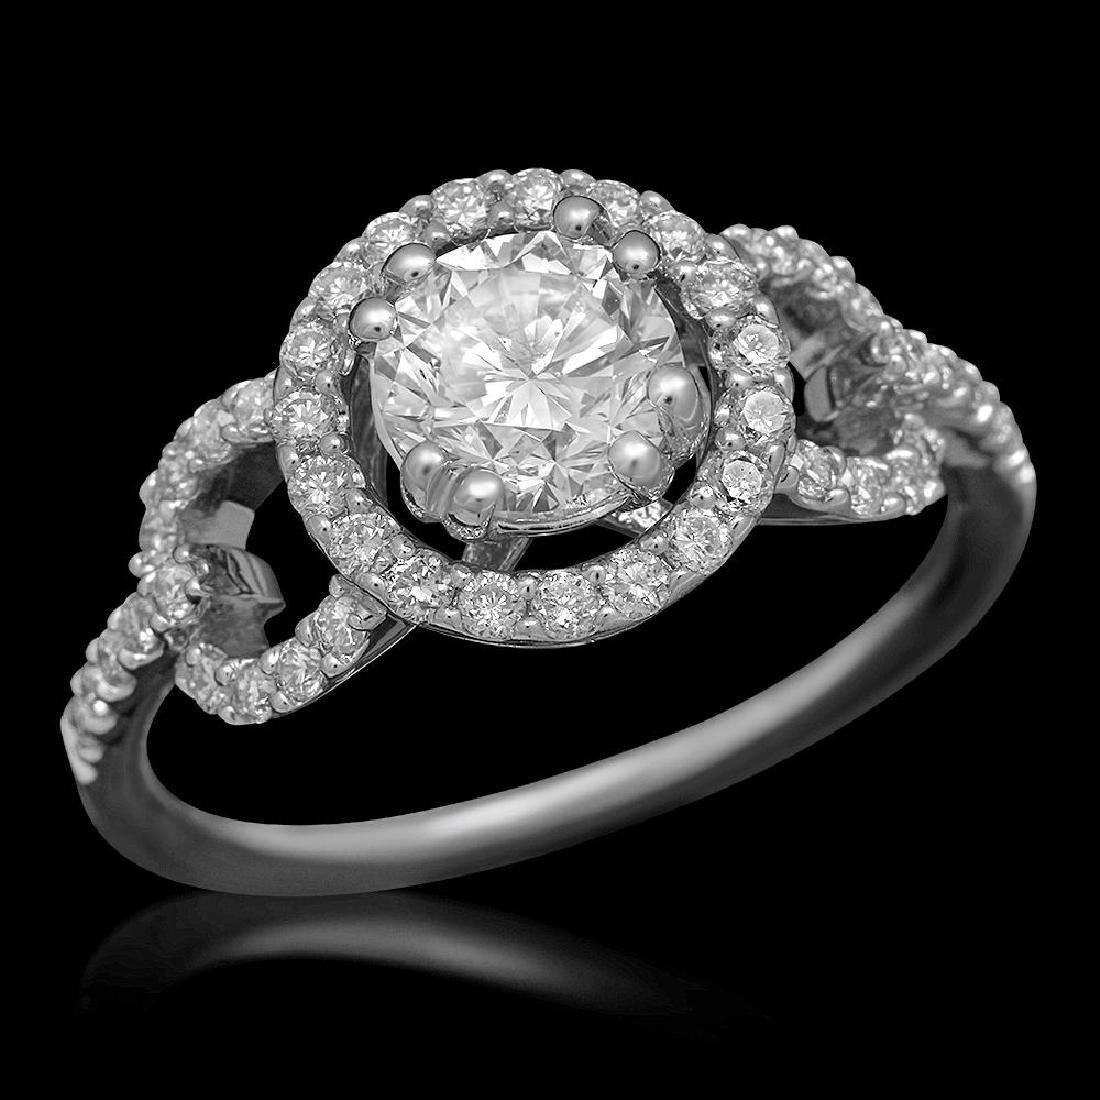 14K Gold 1.44ct Diamond Ring